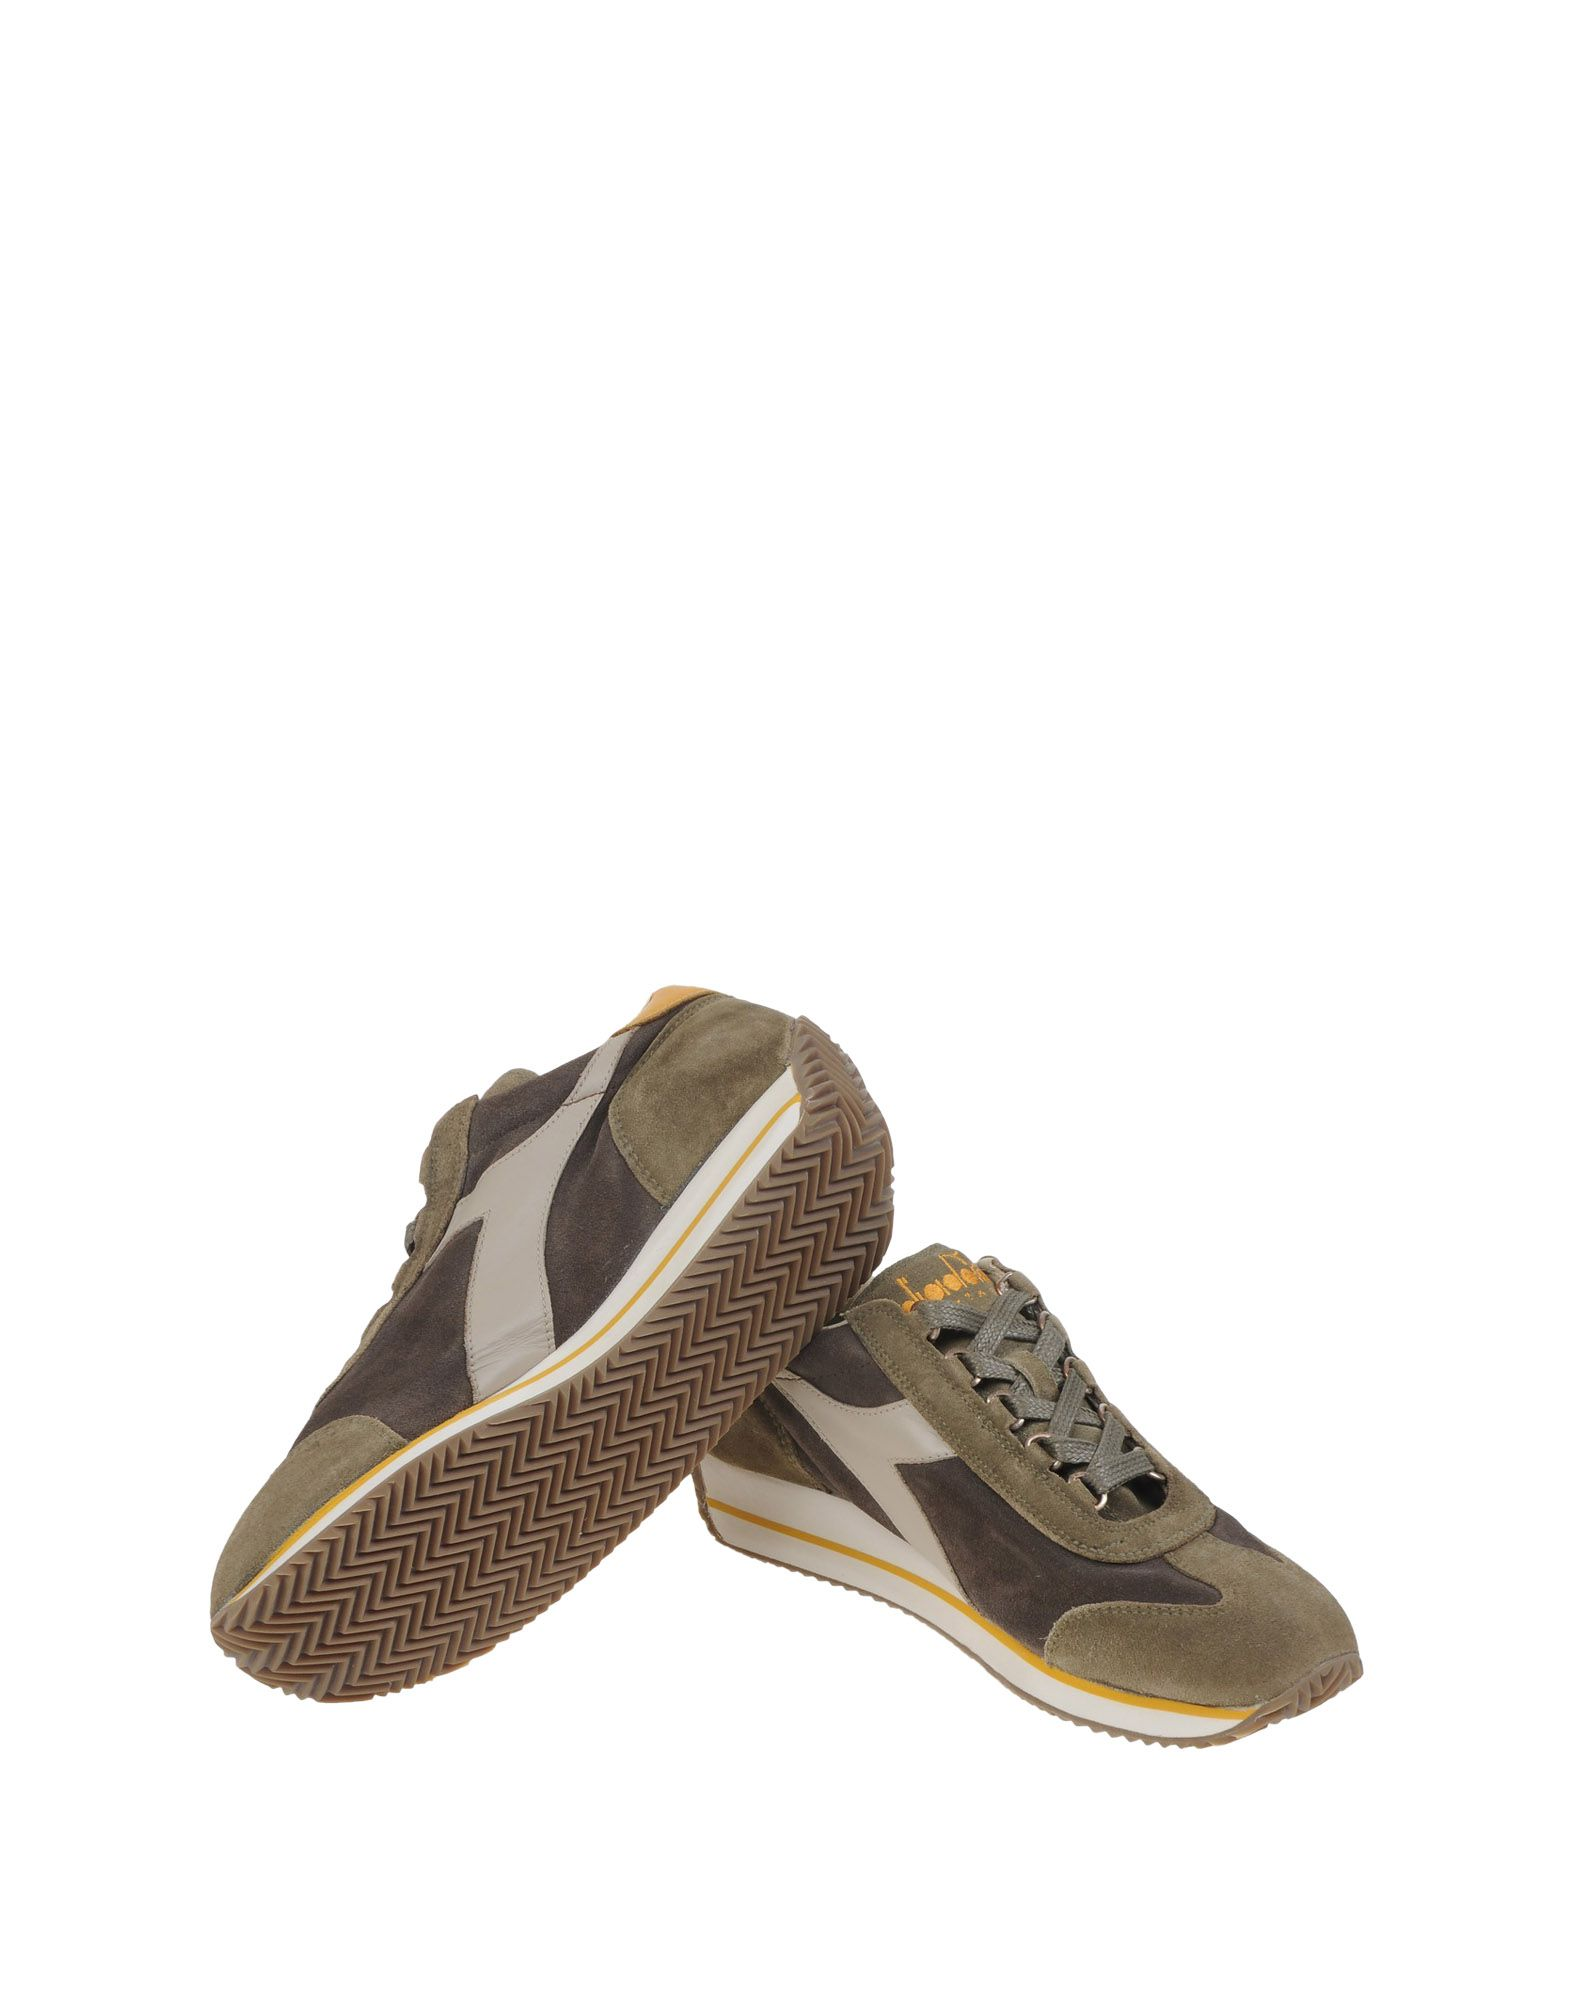 Sneakers Diadora Heritage Equipe W S. Sw Hh - Femme - Sneakers Diadora Heritage sur